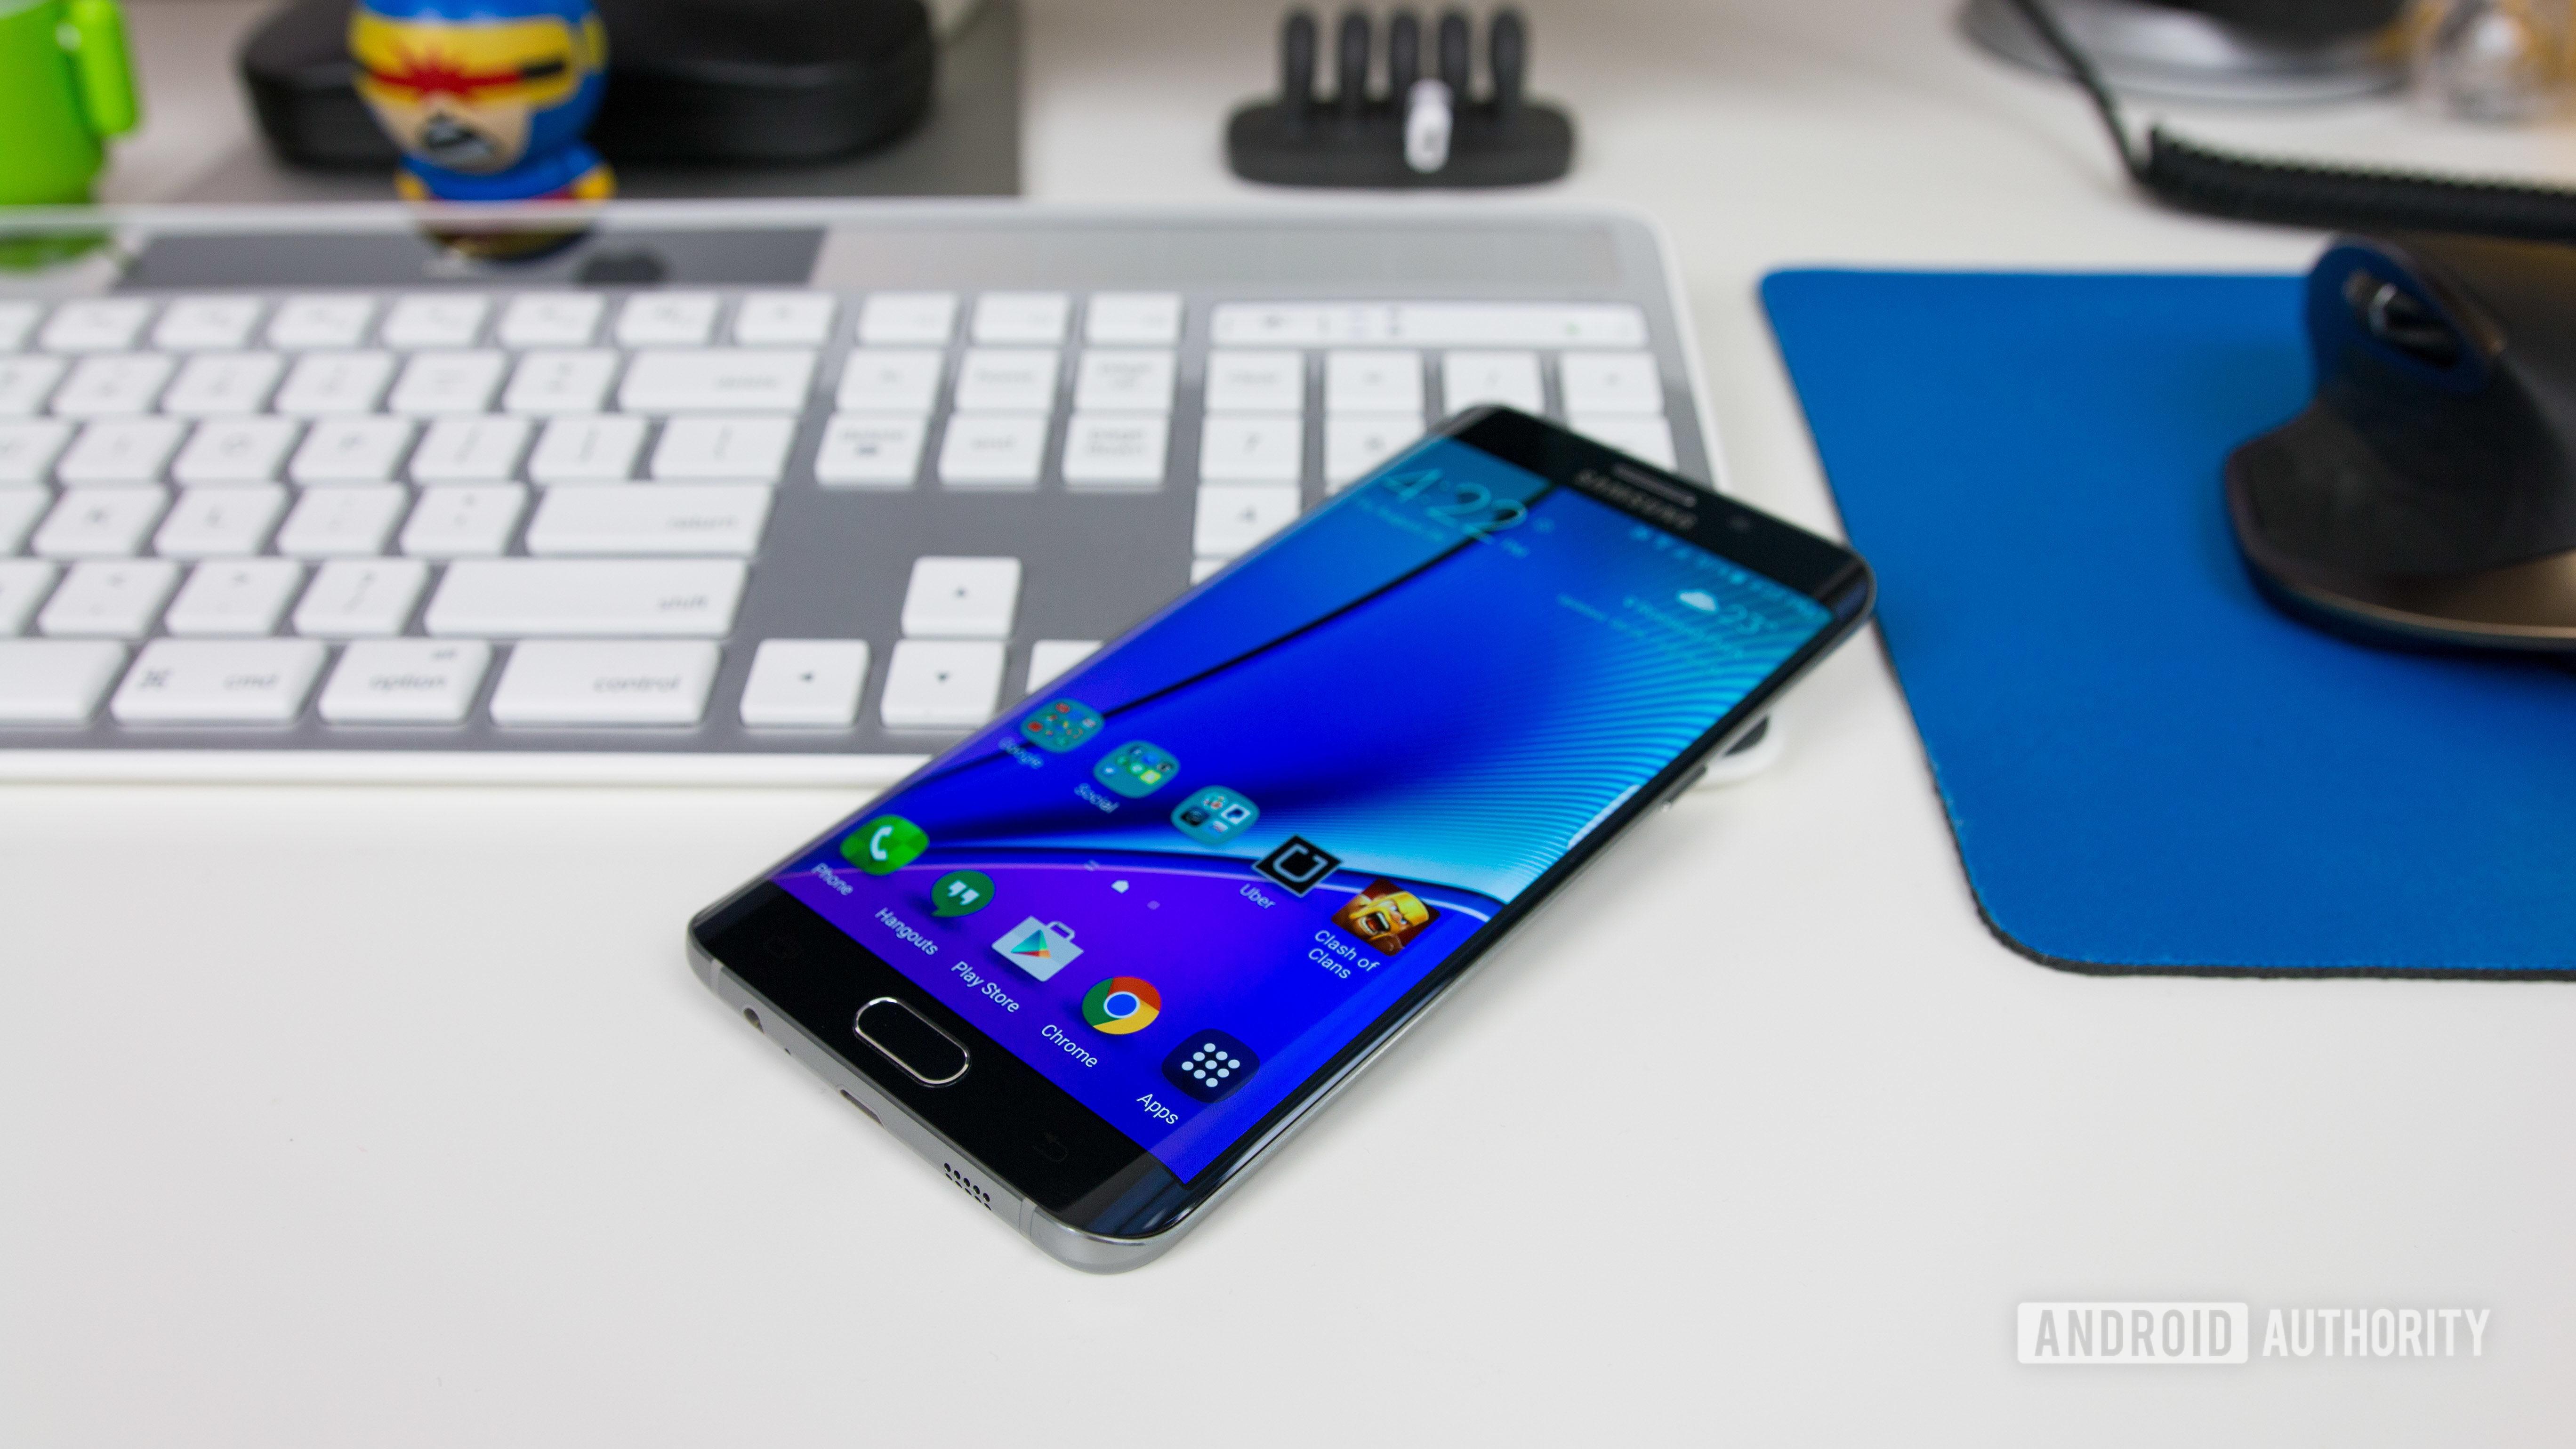 The Samsung Galaxy S6 Edge lying on a silver keyboard.